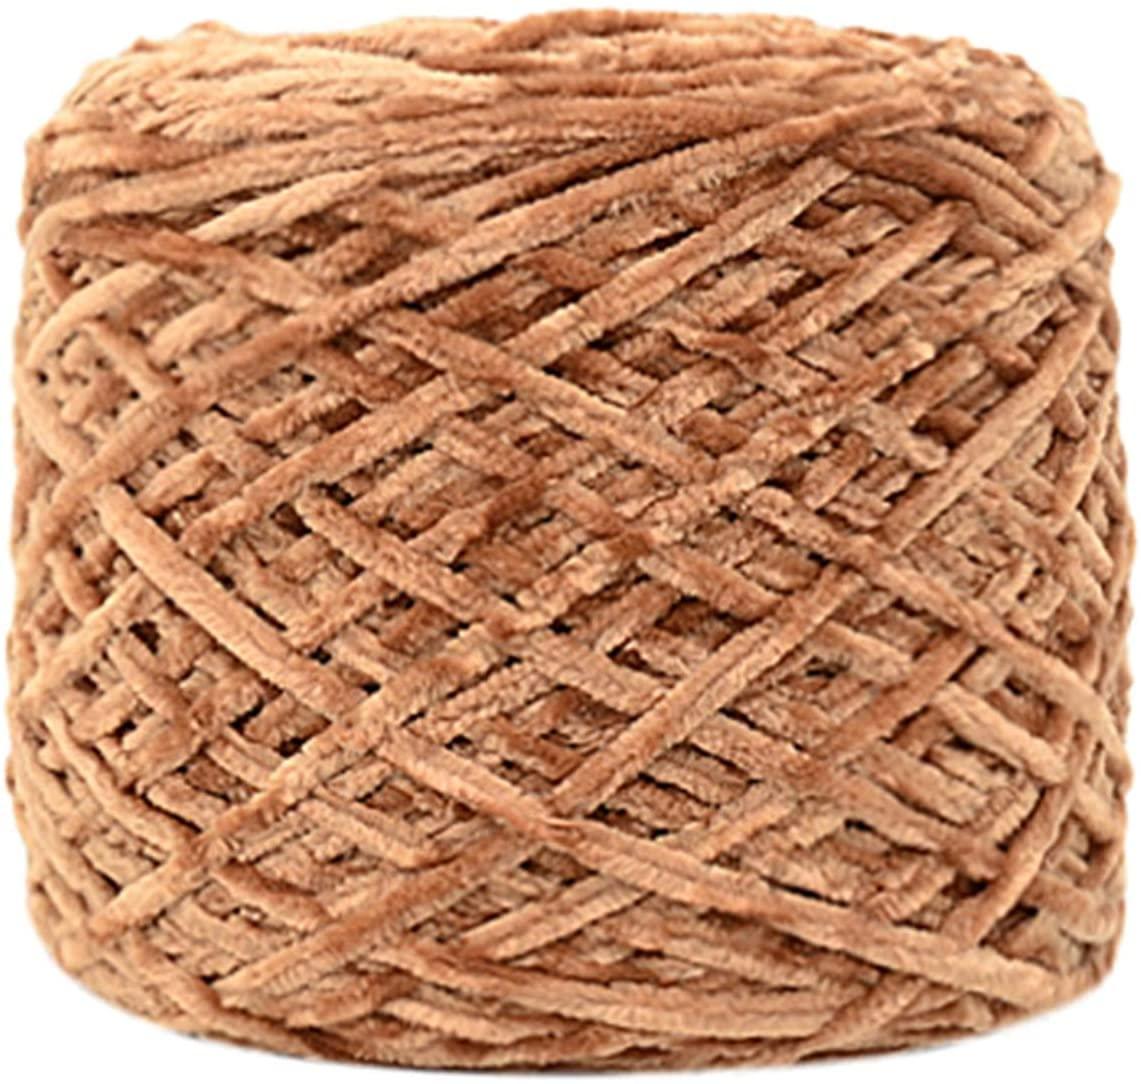 100G Gold Velvet Yarn Roving Scarf Knit Wool Yarn Thickness Warm Hat Household Crochet para Tejer Yarn for Knitting Wool Yarn,G